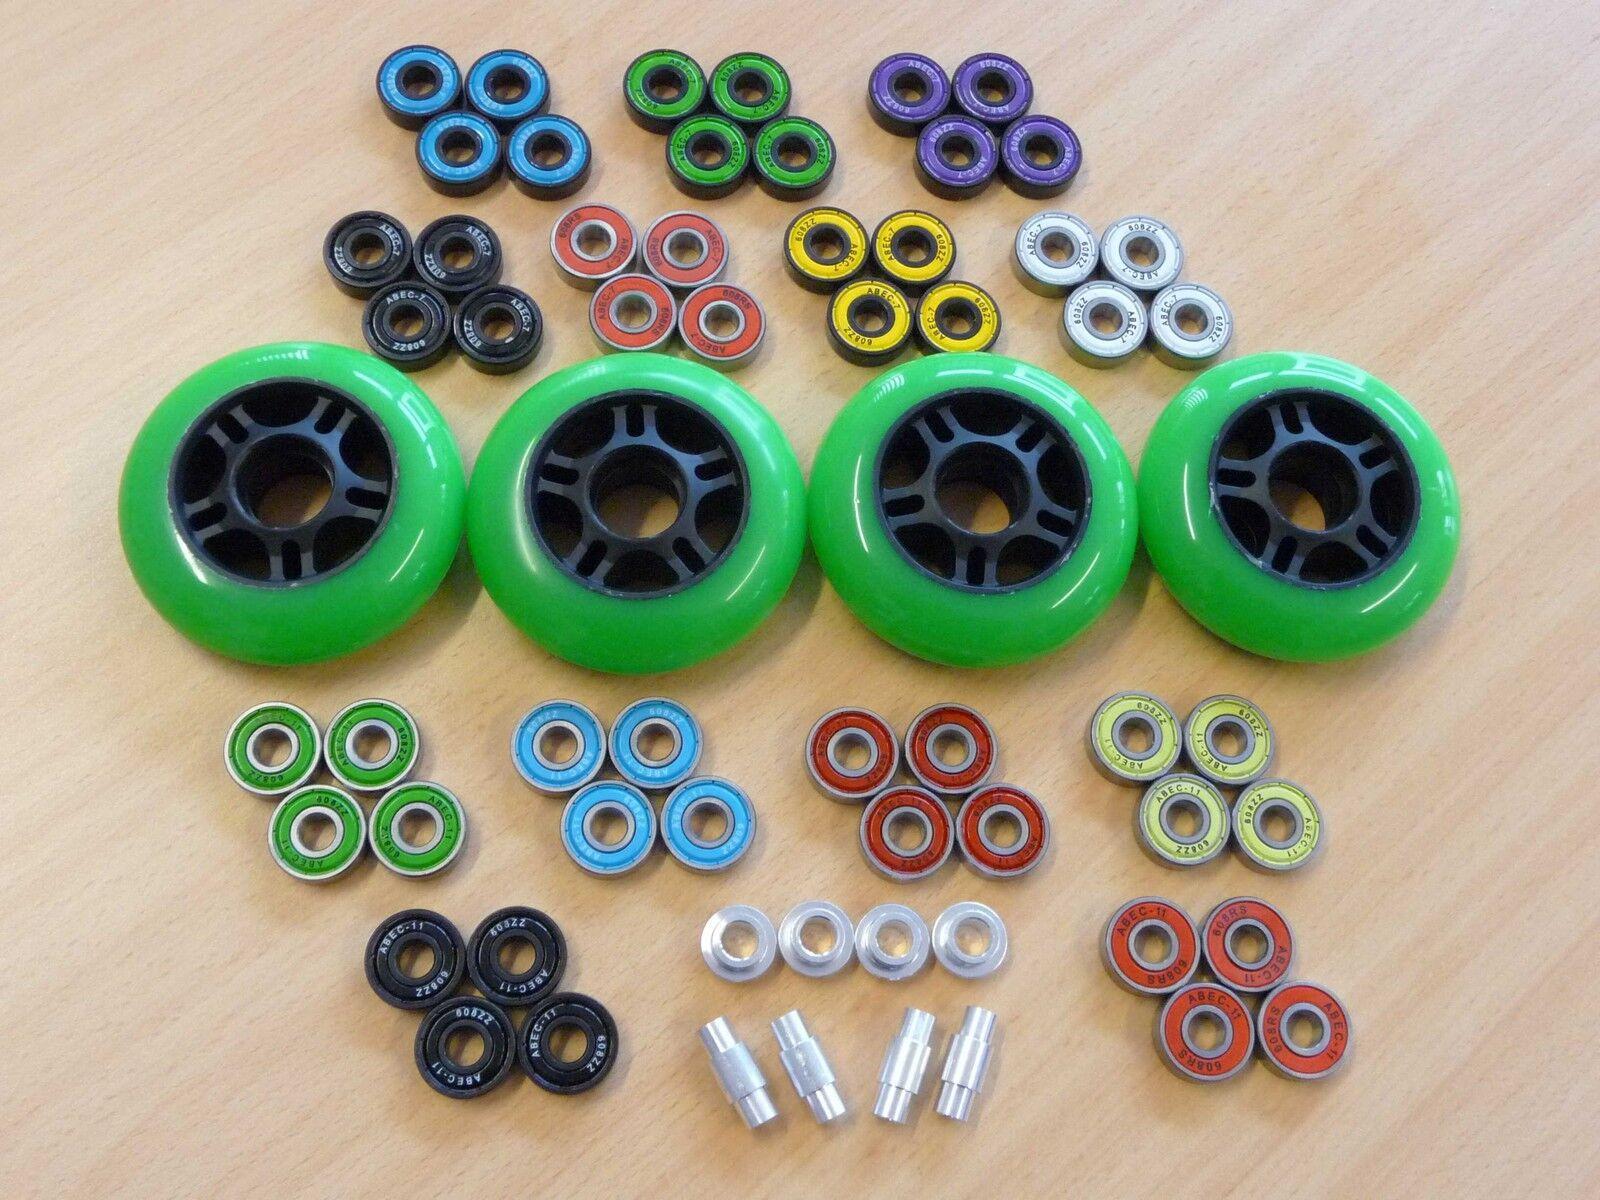 NEU   8x Wheel 80mm/84A-grün + 16x Lager ABEC11 + 8x AluSpacer   NEU